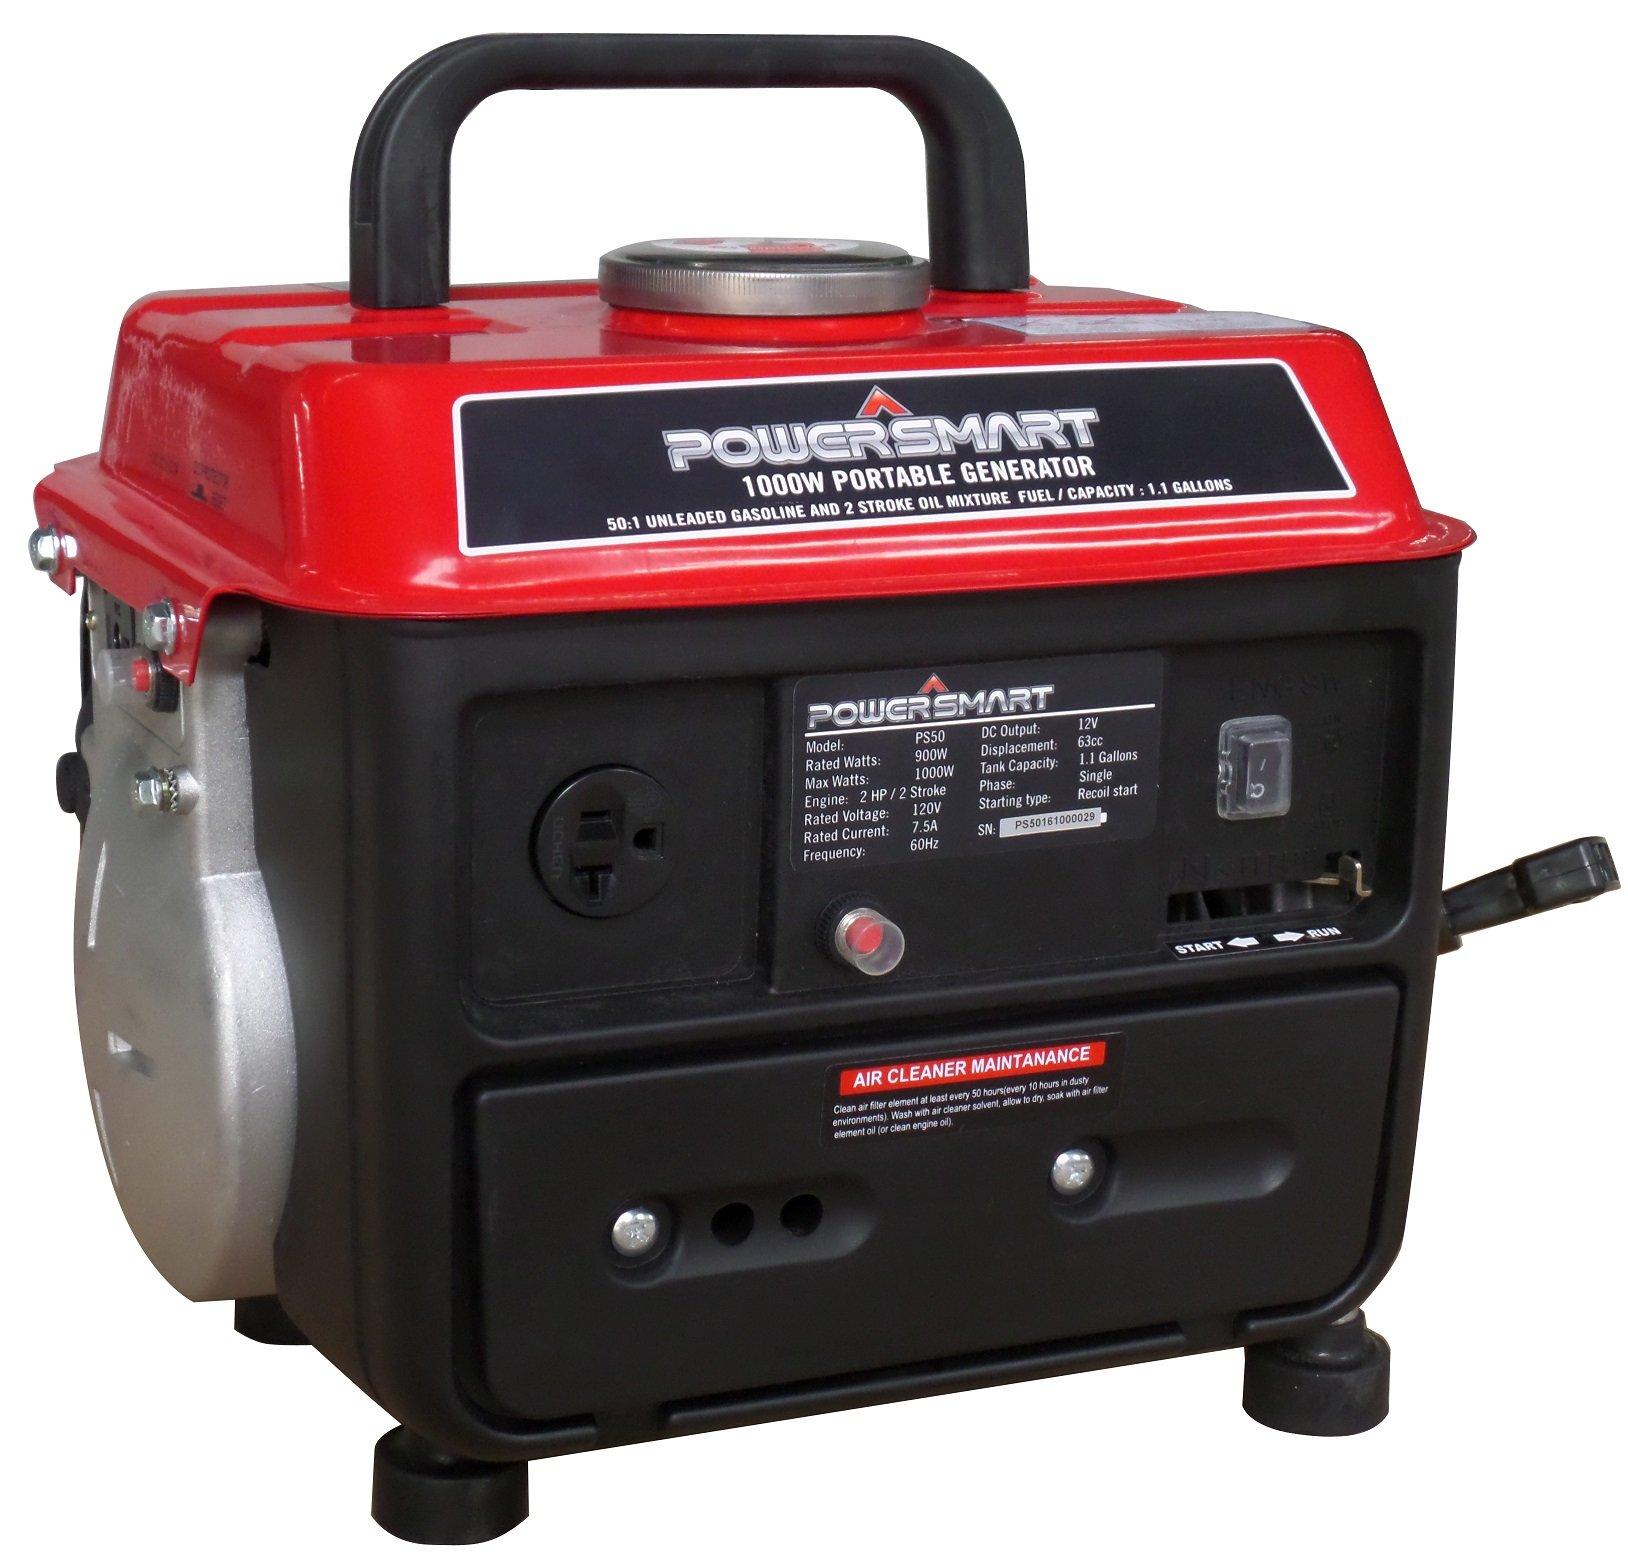 PowerSmart PS50 Portable Generator, Red/Black